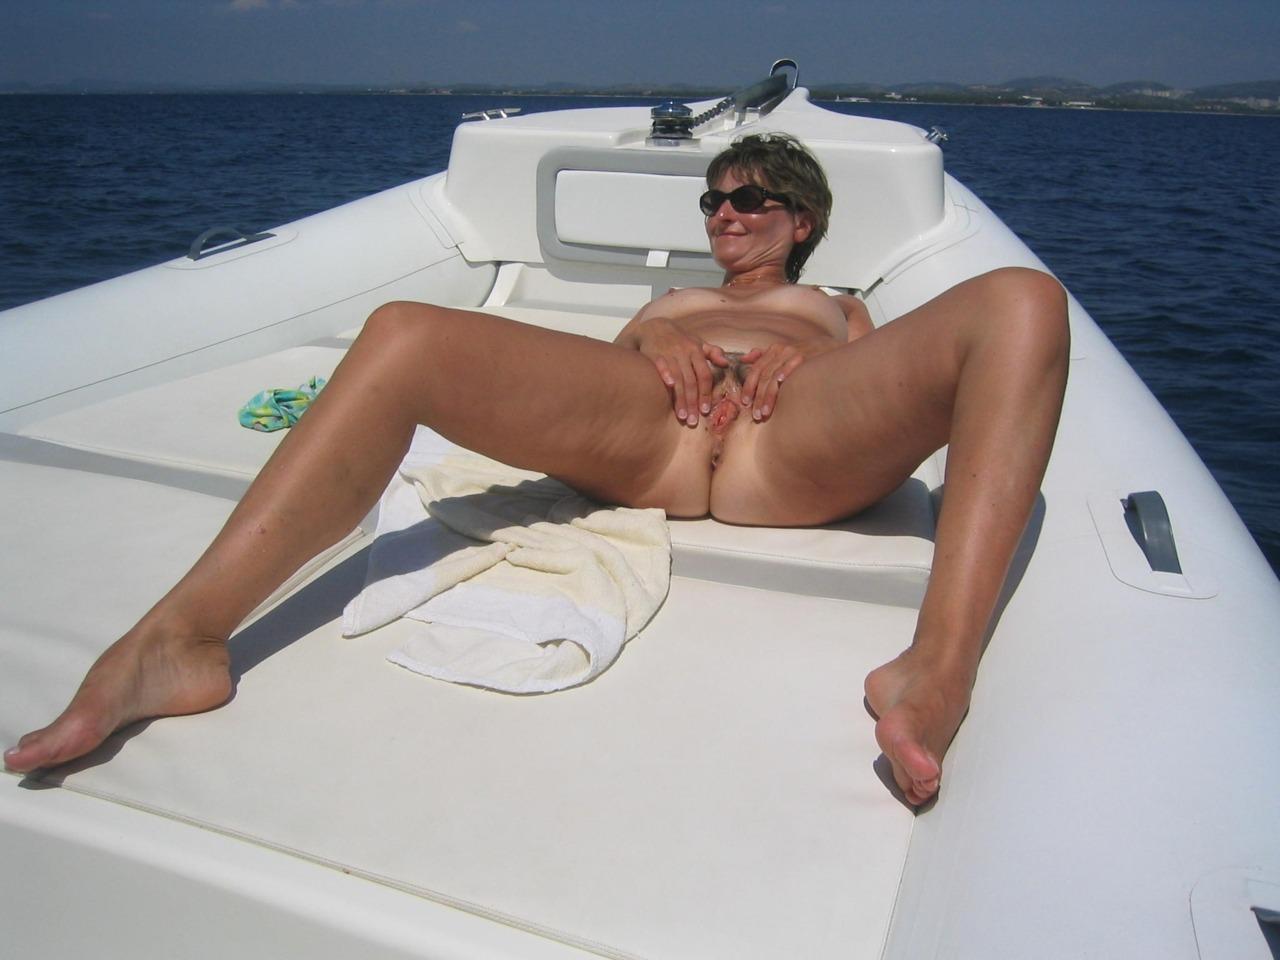 German wife interracial vacation tumblr ig fap